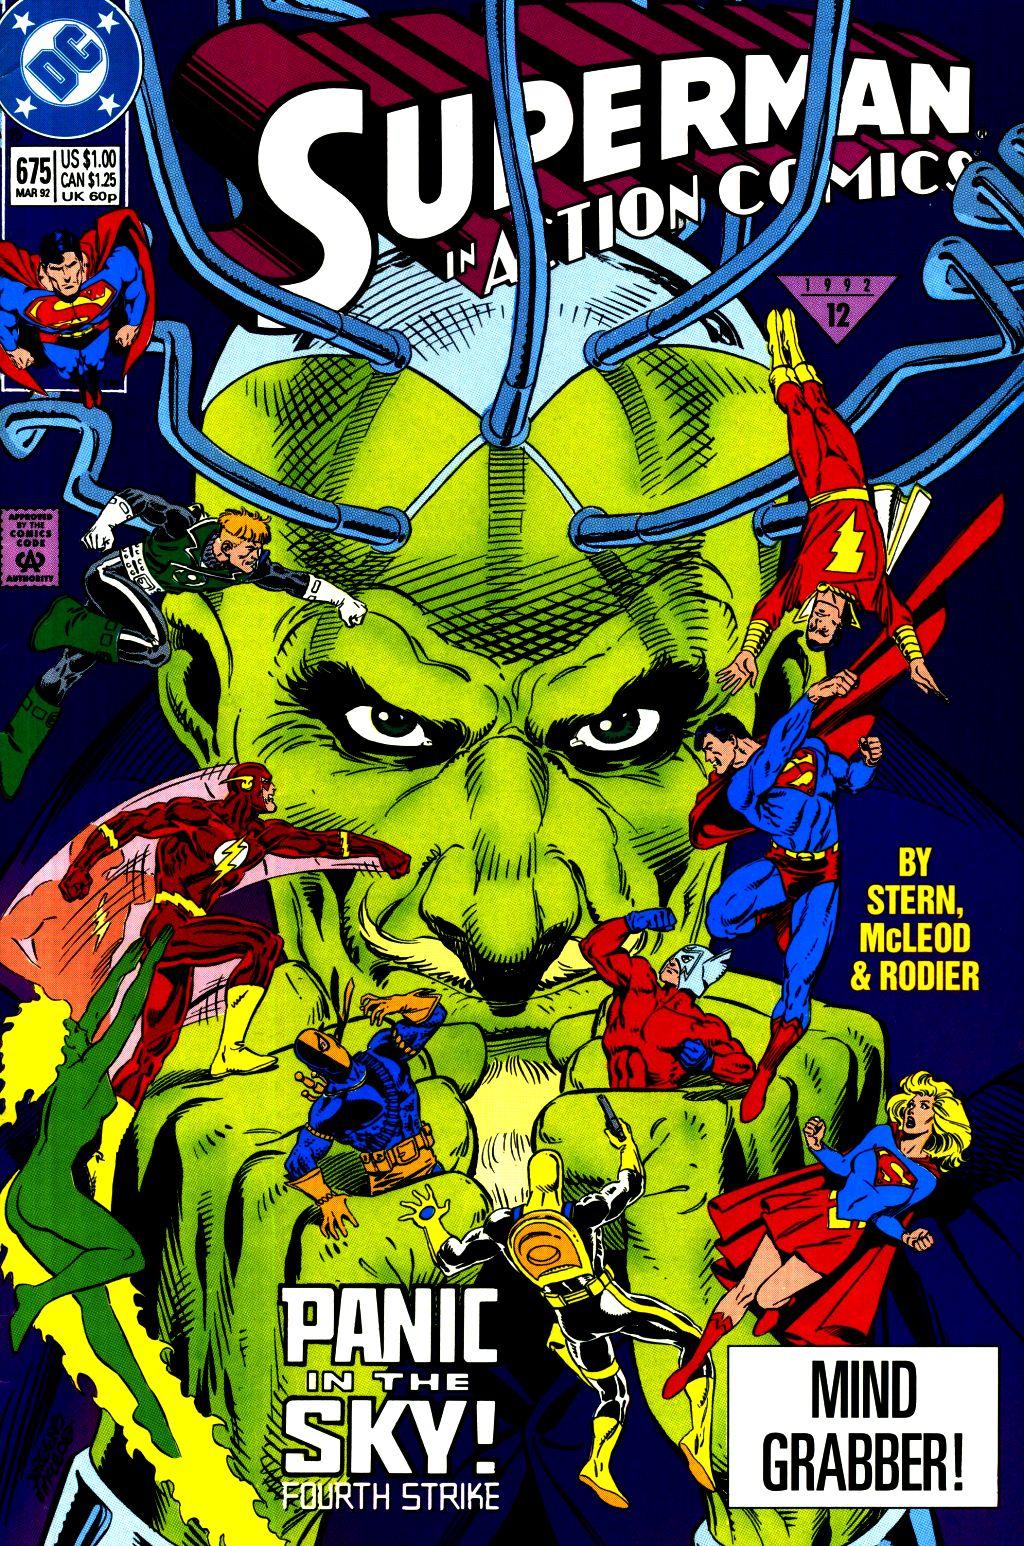 Action Comics (1938) 675 Page 1